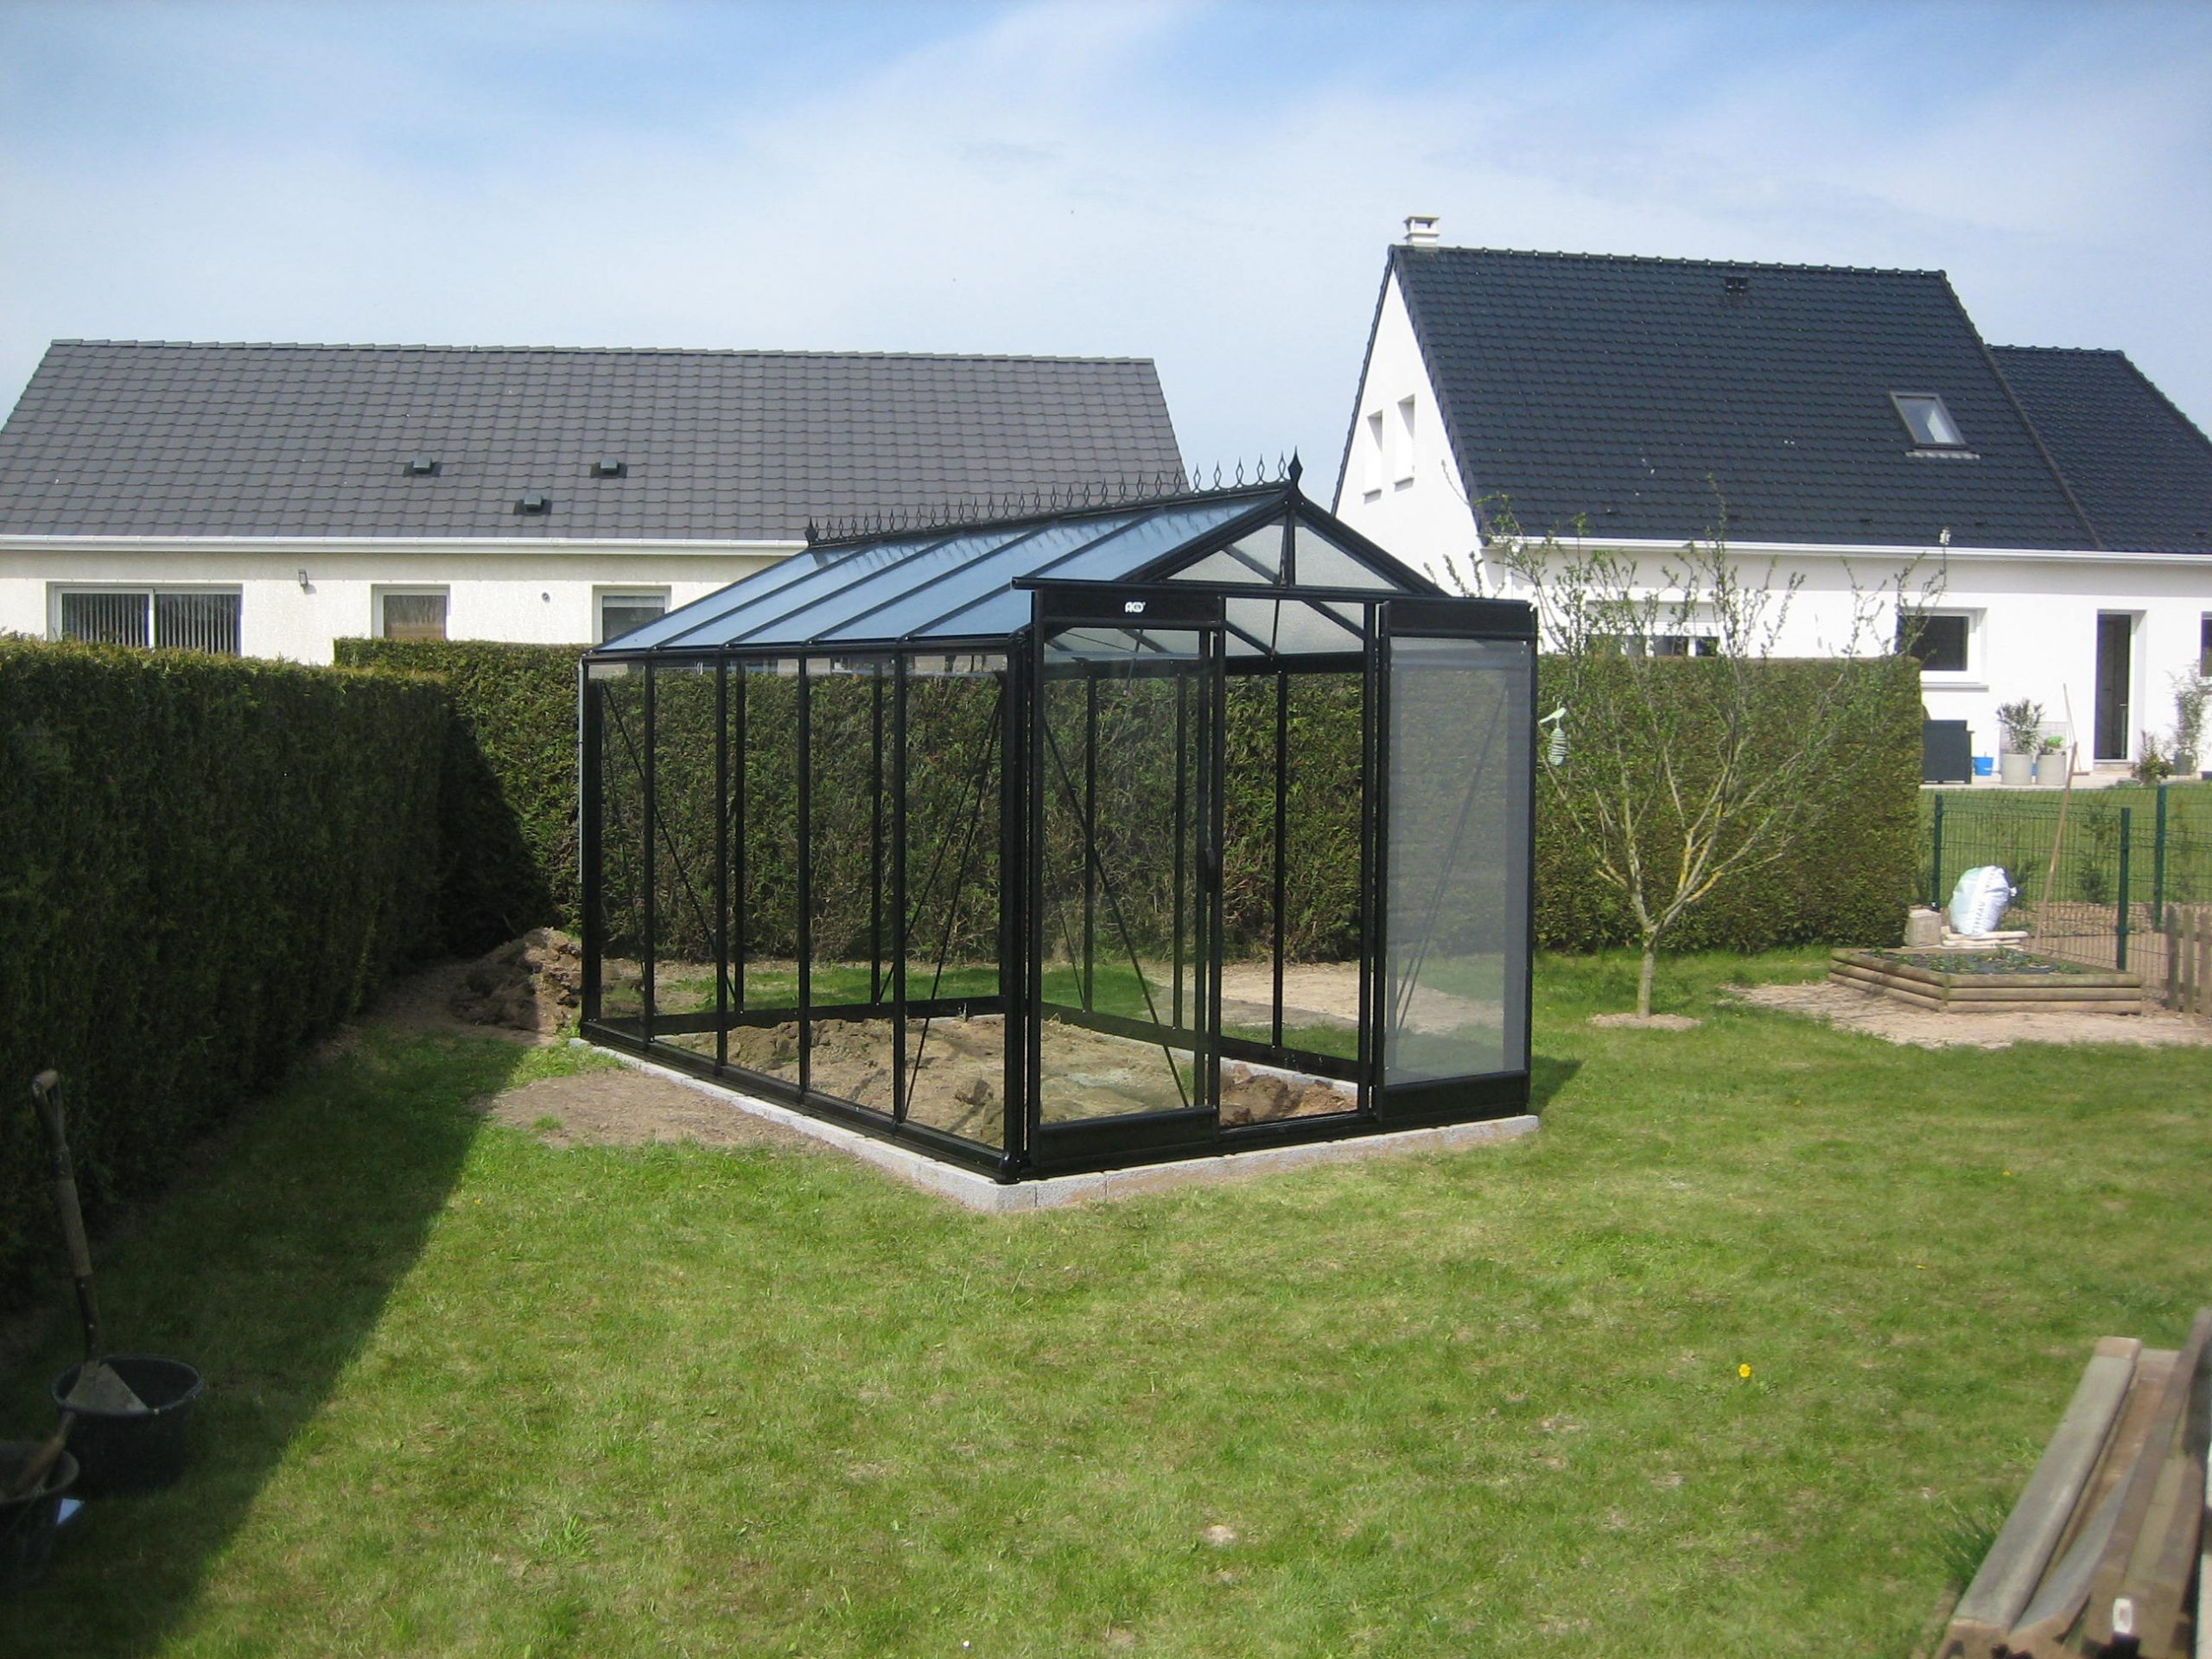 Serre De Jardin En Ligne - Matovert dedans Le Bon Coin Serre De Jardin